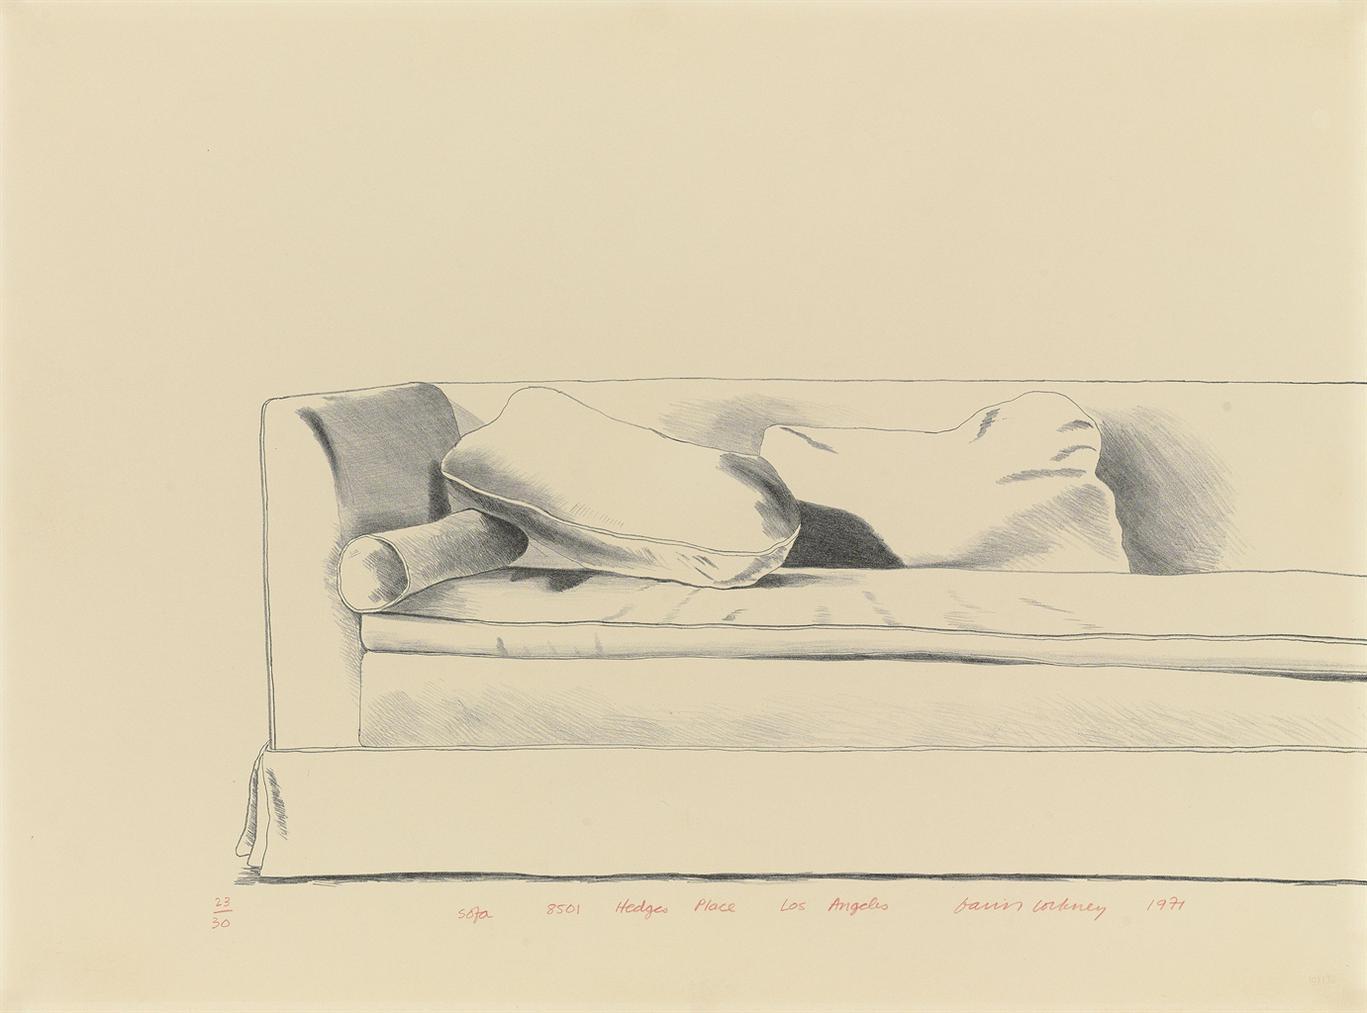 David Hockney-Sofa, 8501 Hedges Place, Los Angeles-1971